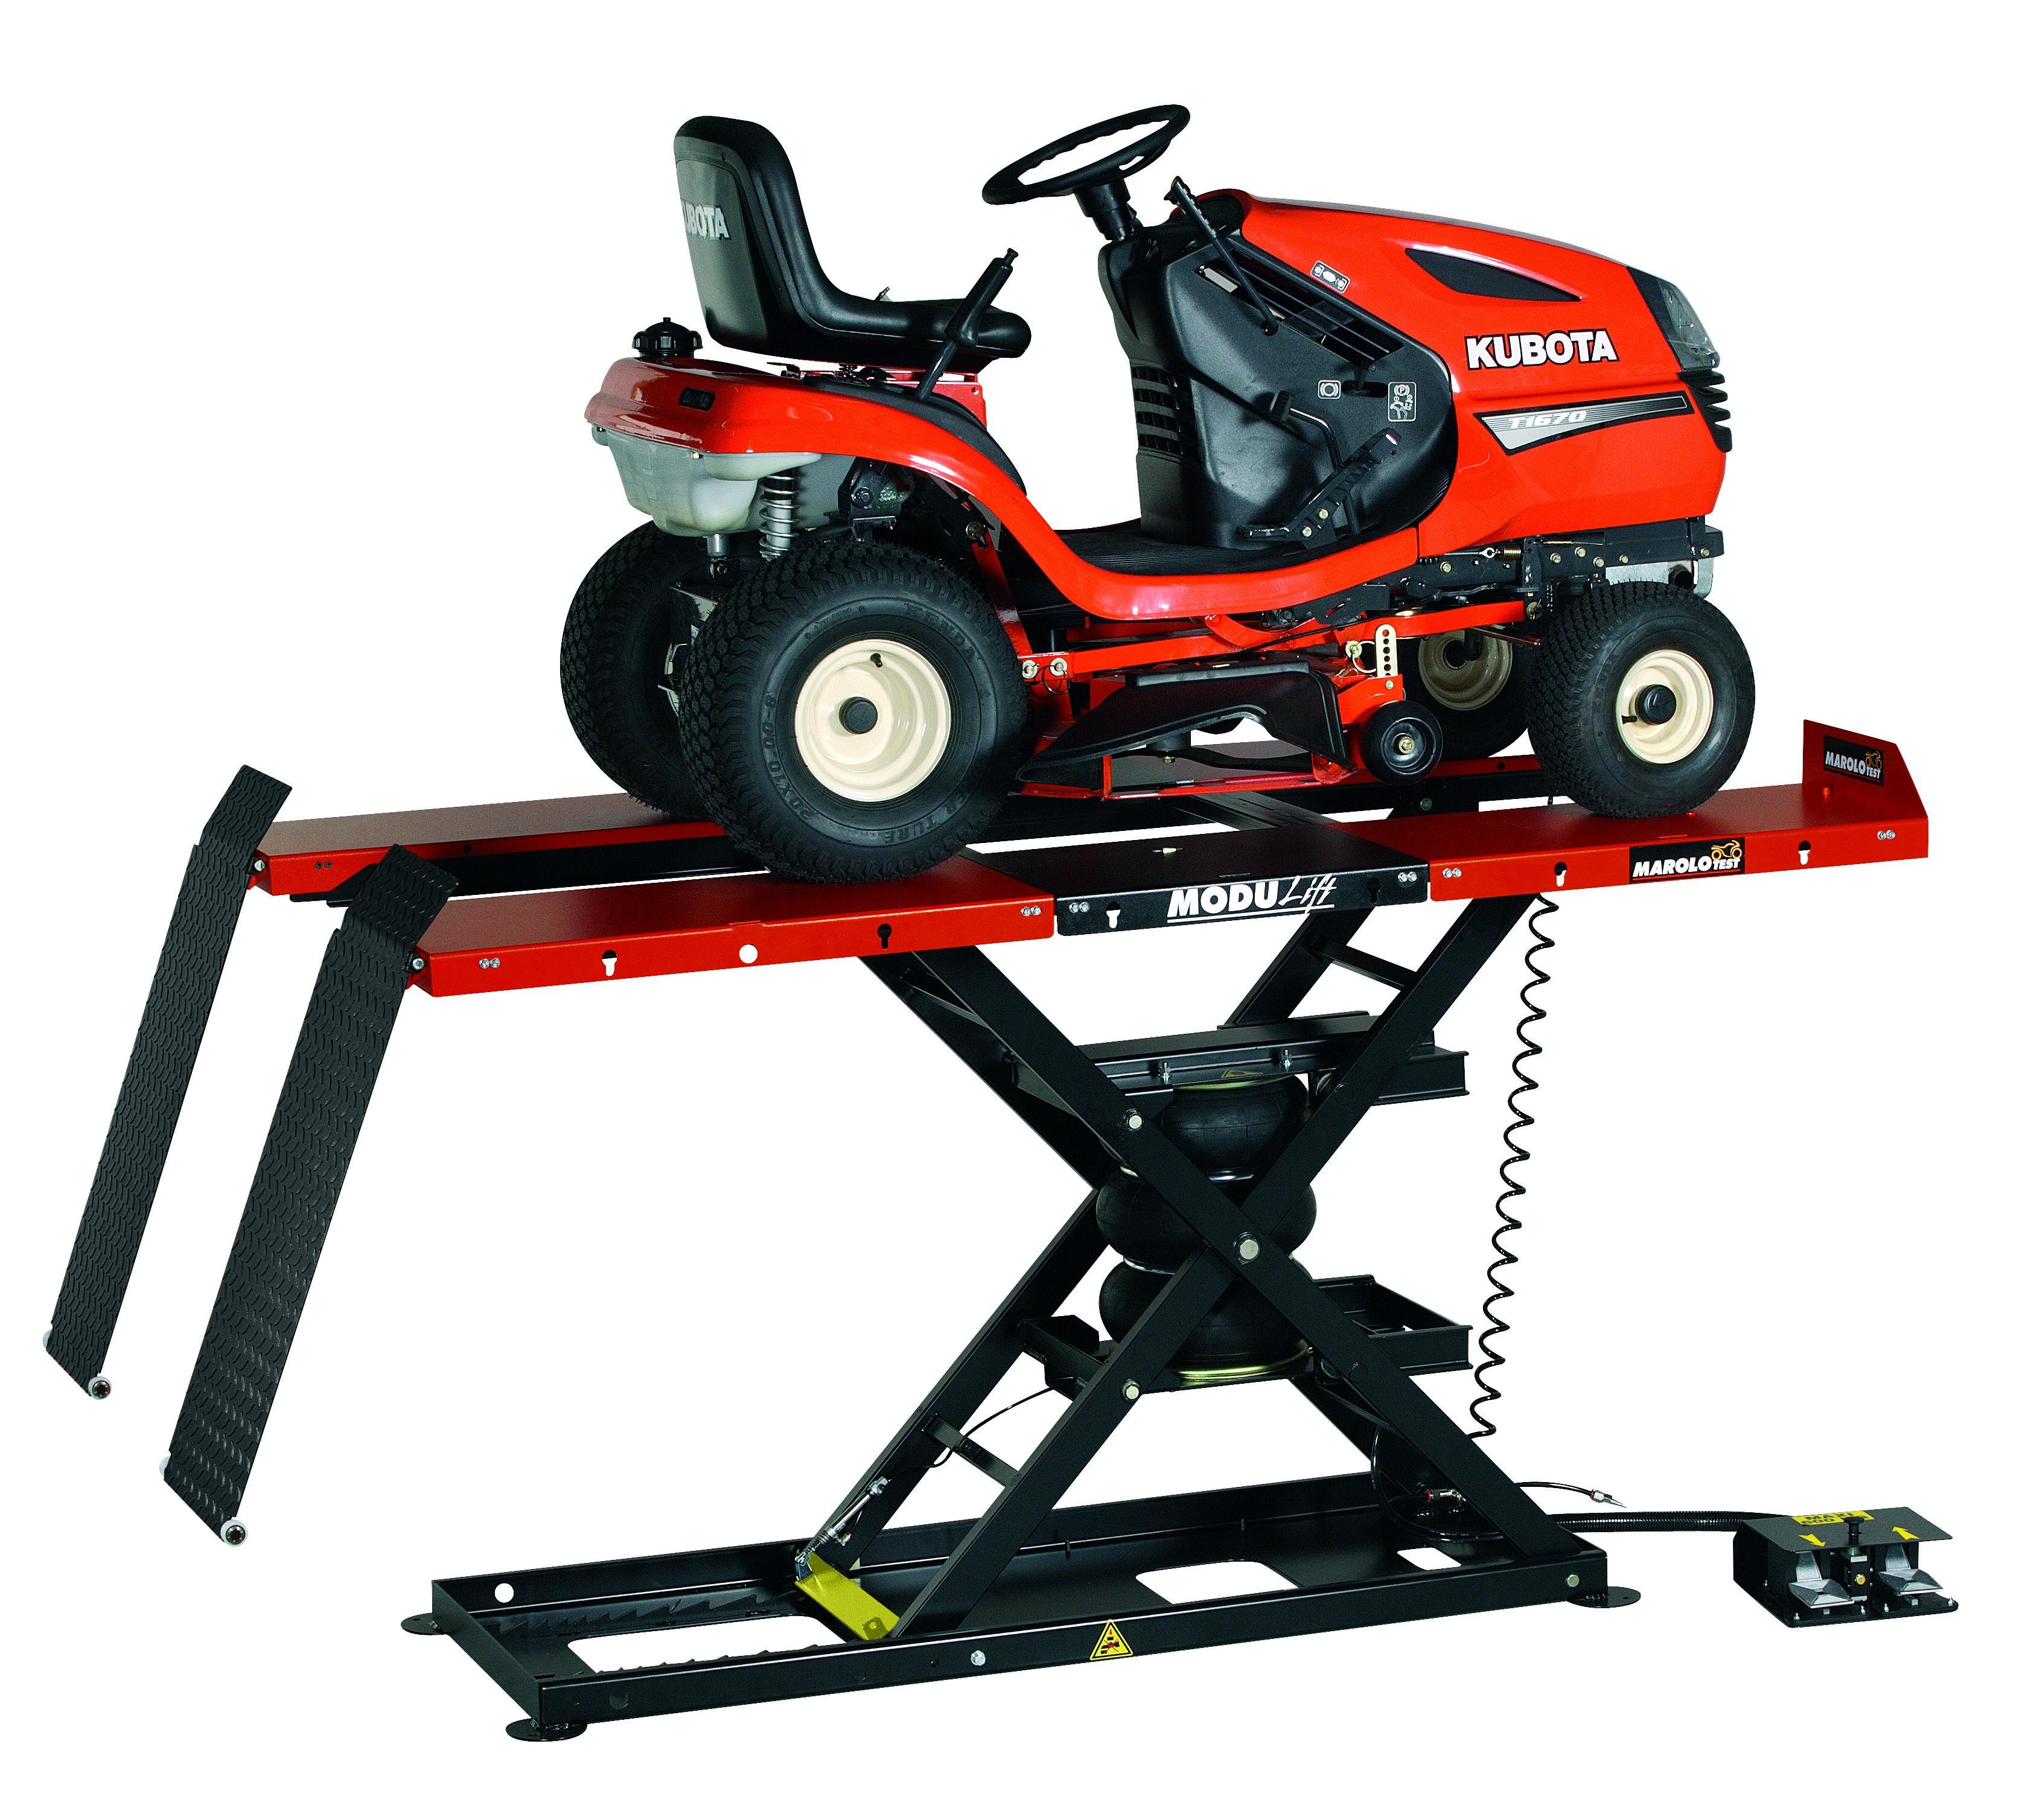 marolotest lift modulift 1000 mop pneumatic husqvarna 51 chainsaw owners manual husqvarna 51 shop manual